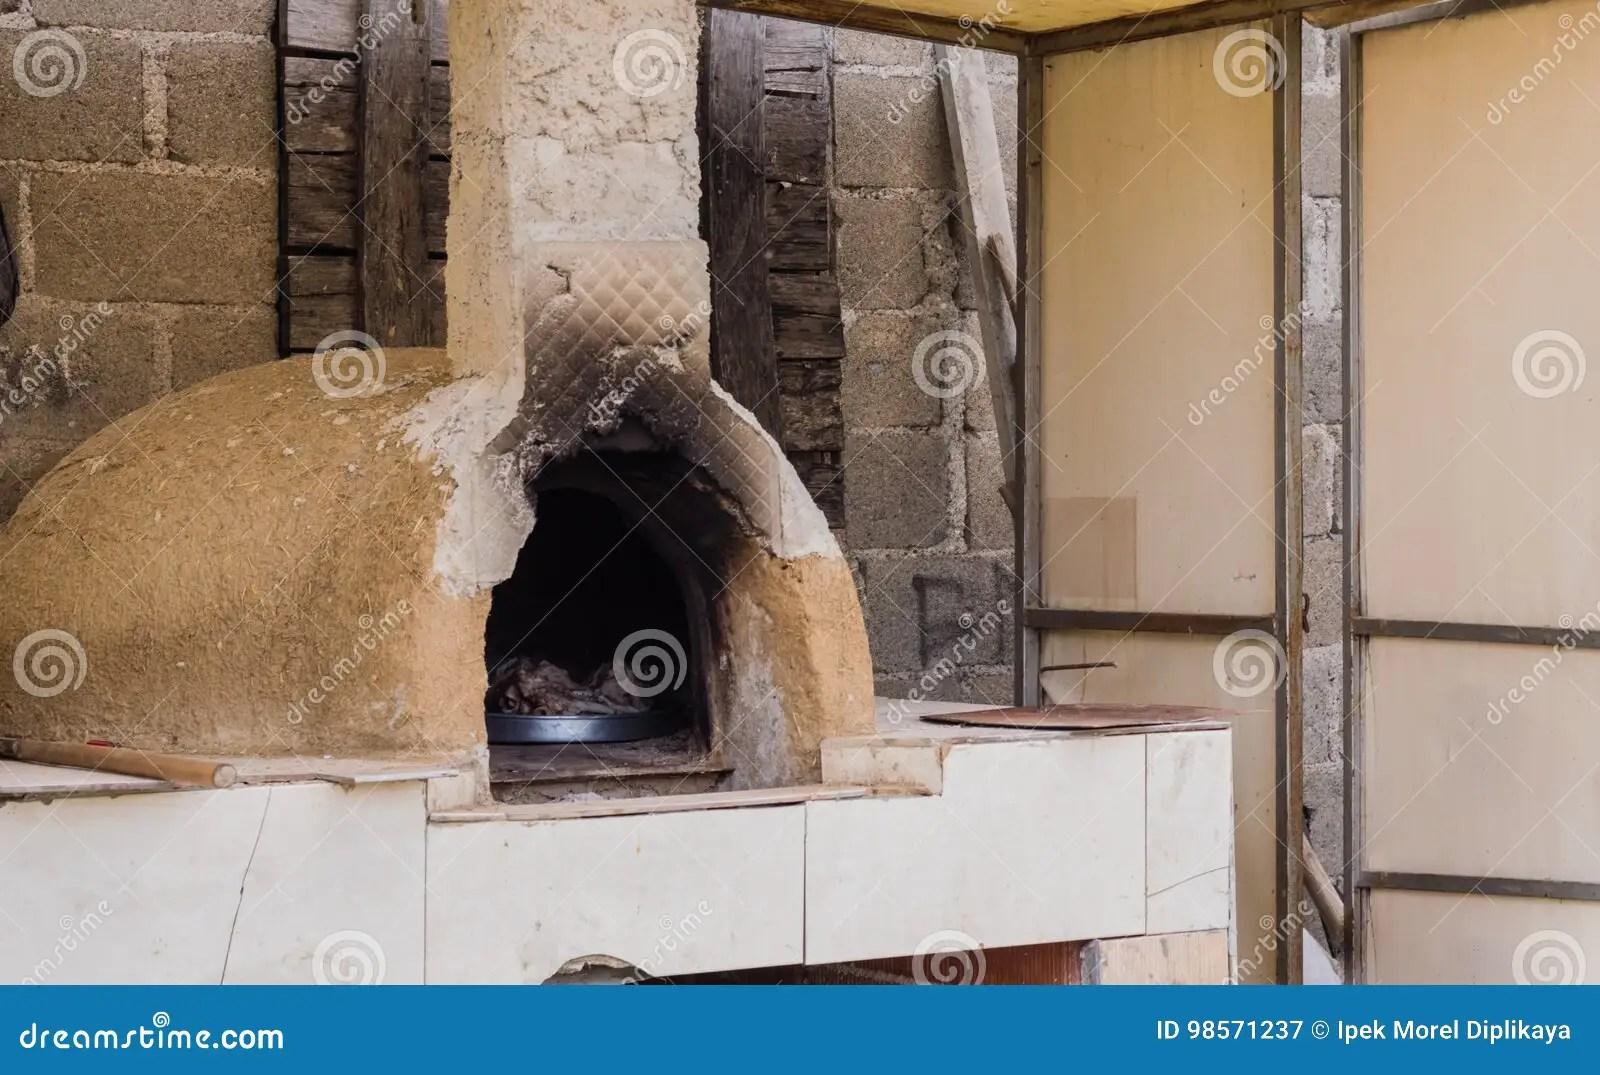 sears kitchen sinks reviews 室外黏土烤箱在屋顶下在传统村庄房子 埃斯基谢希尔 土耳其里库存图片 室外黏土烤箱在屋顶下在一个传统村庄房子里 土耳其